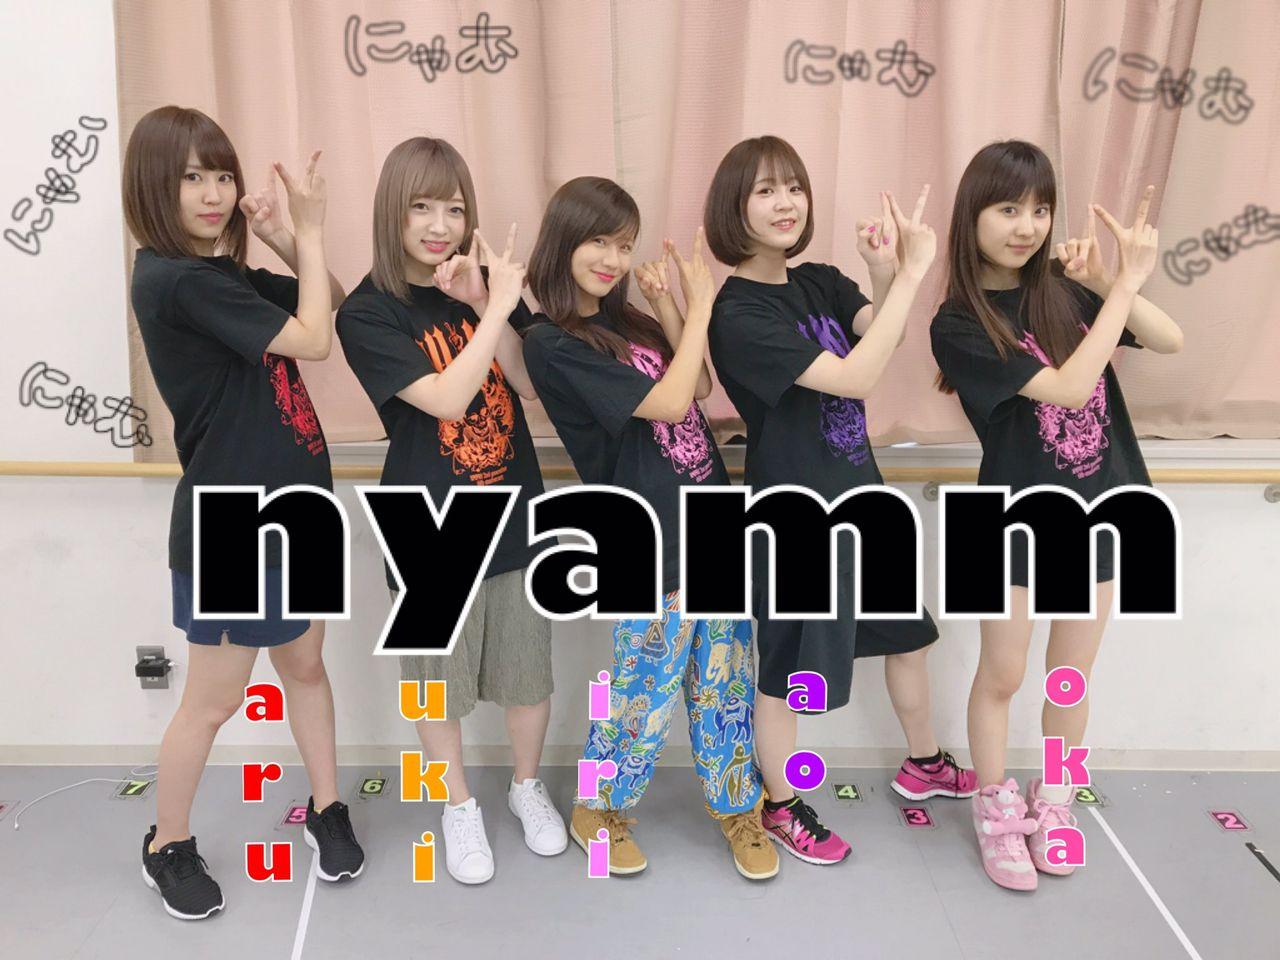 【AKB48じゃんけん大会】現在のユニット立候補状況まとめ。SKE48出揃う【本日締め切り】